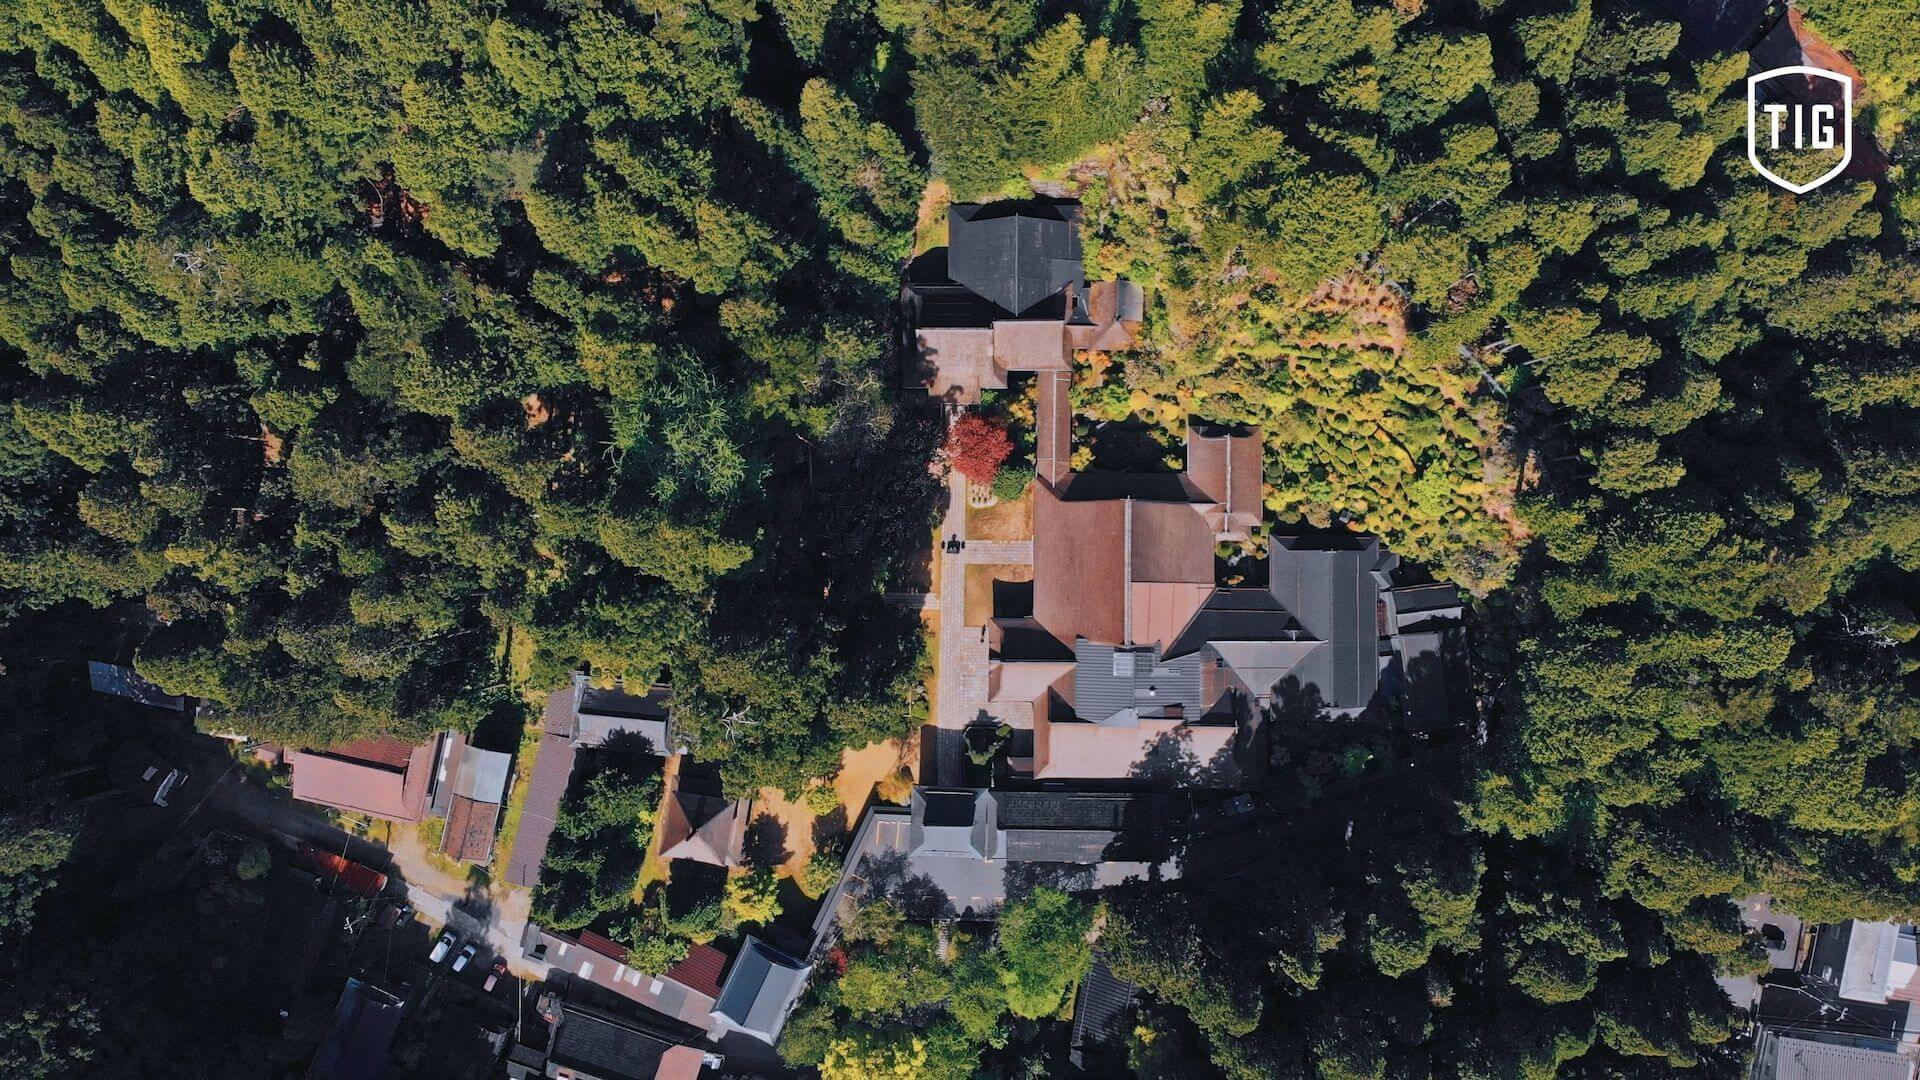 Tsuyoshi Suzukiが高野山金剛三昧院でDJを披露する「密教トランス」映像が公開 music210730-tsuyoshi-suzuki-3